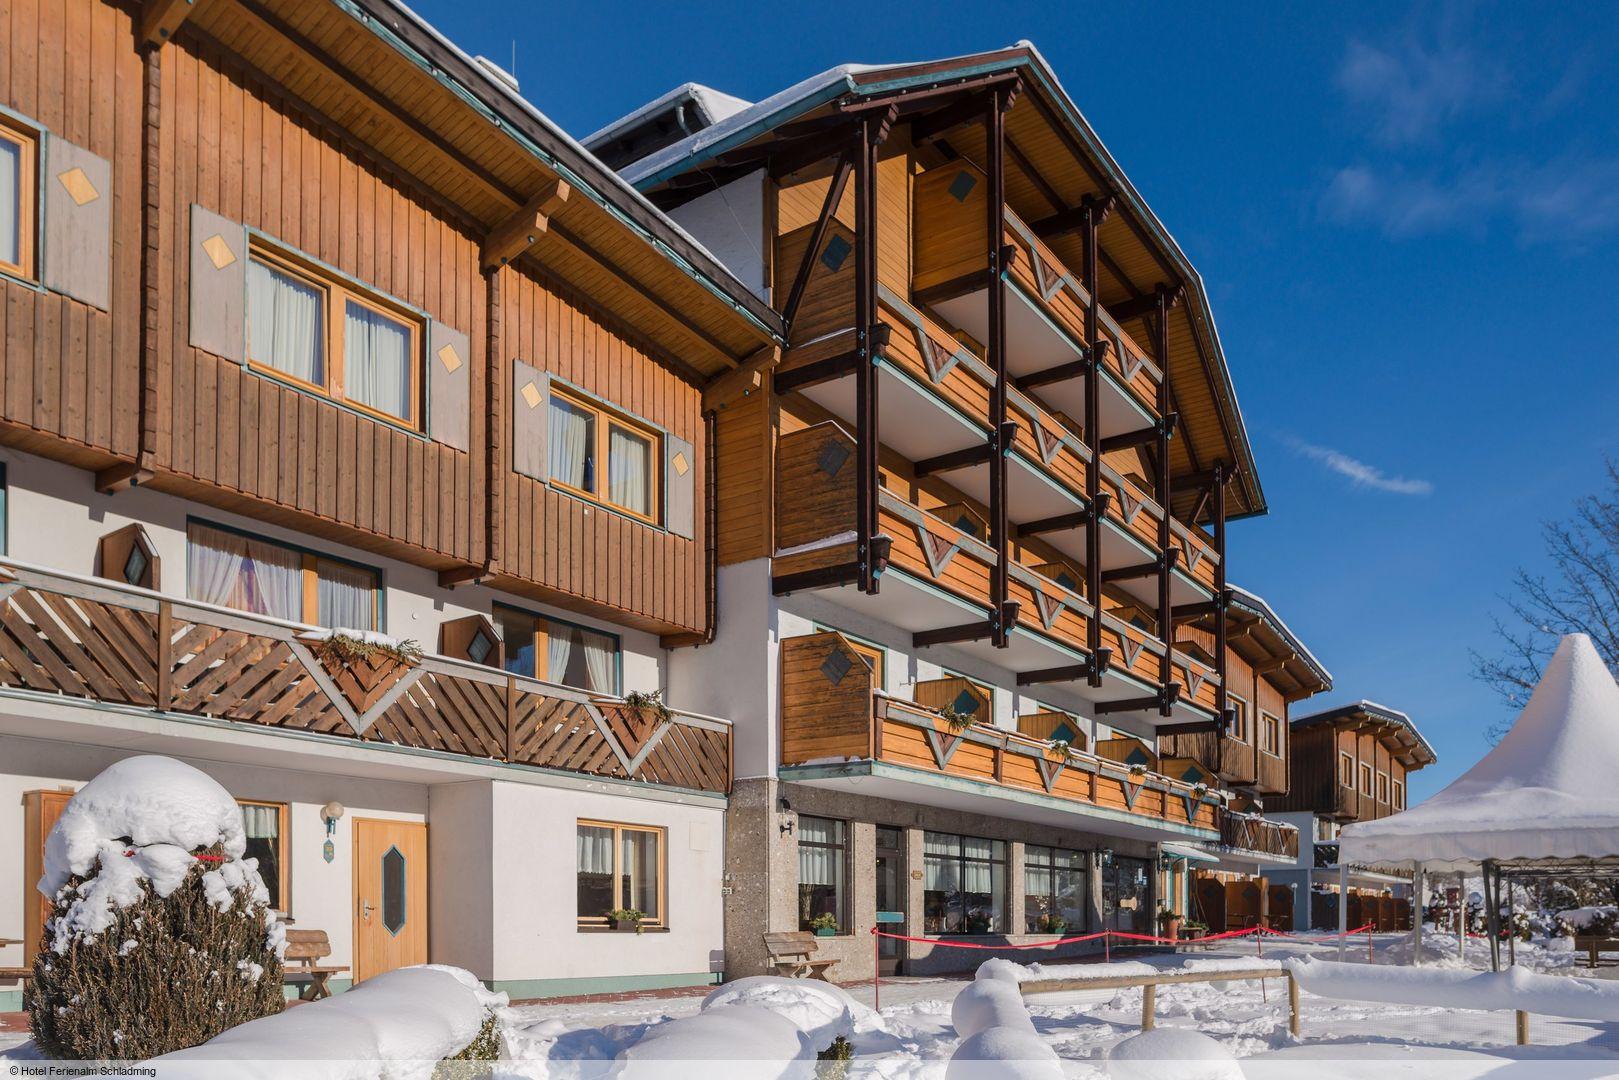 Hotel Ferienalm Schladming - Slide 1